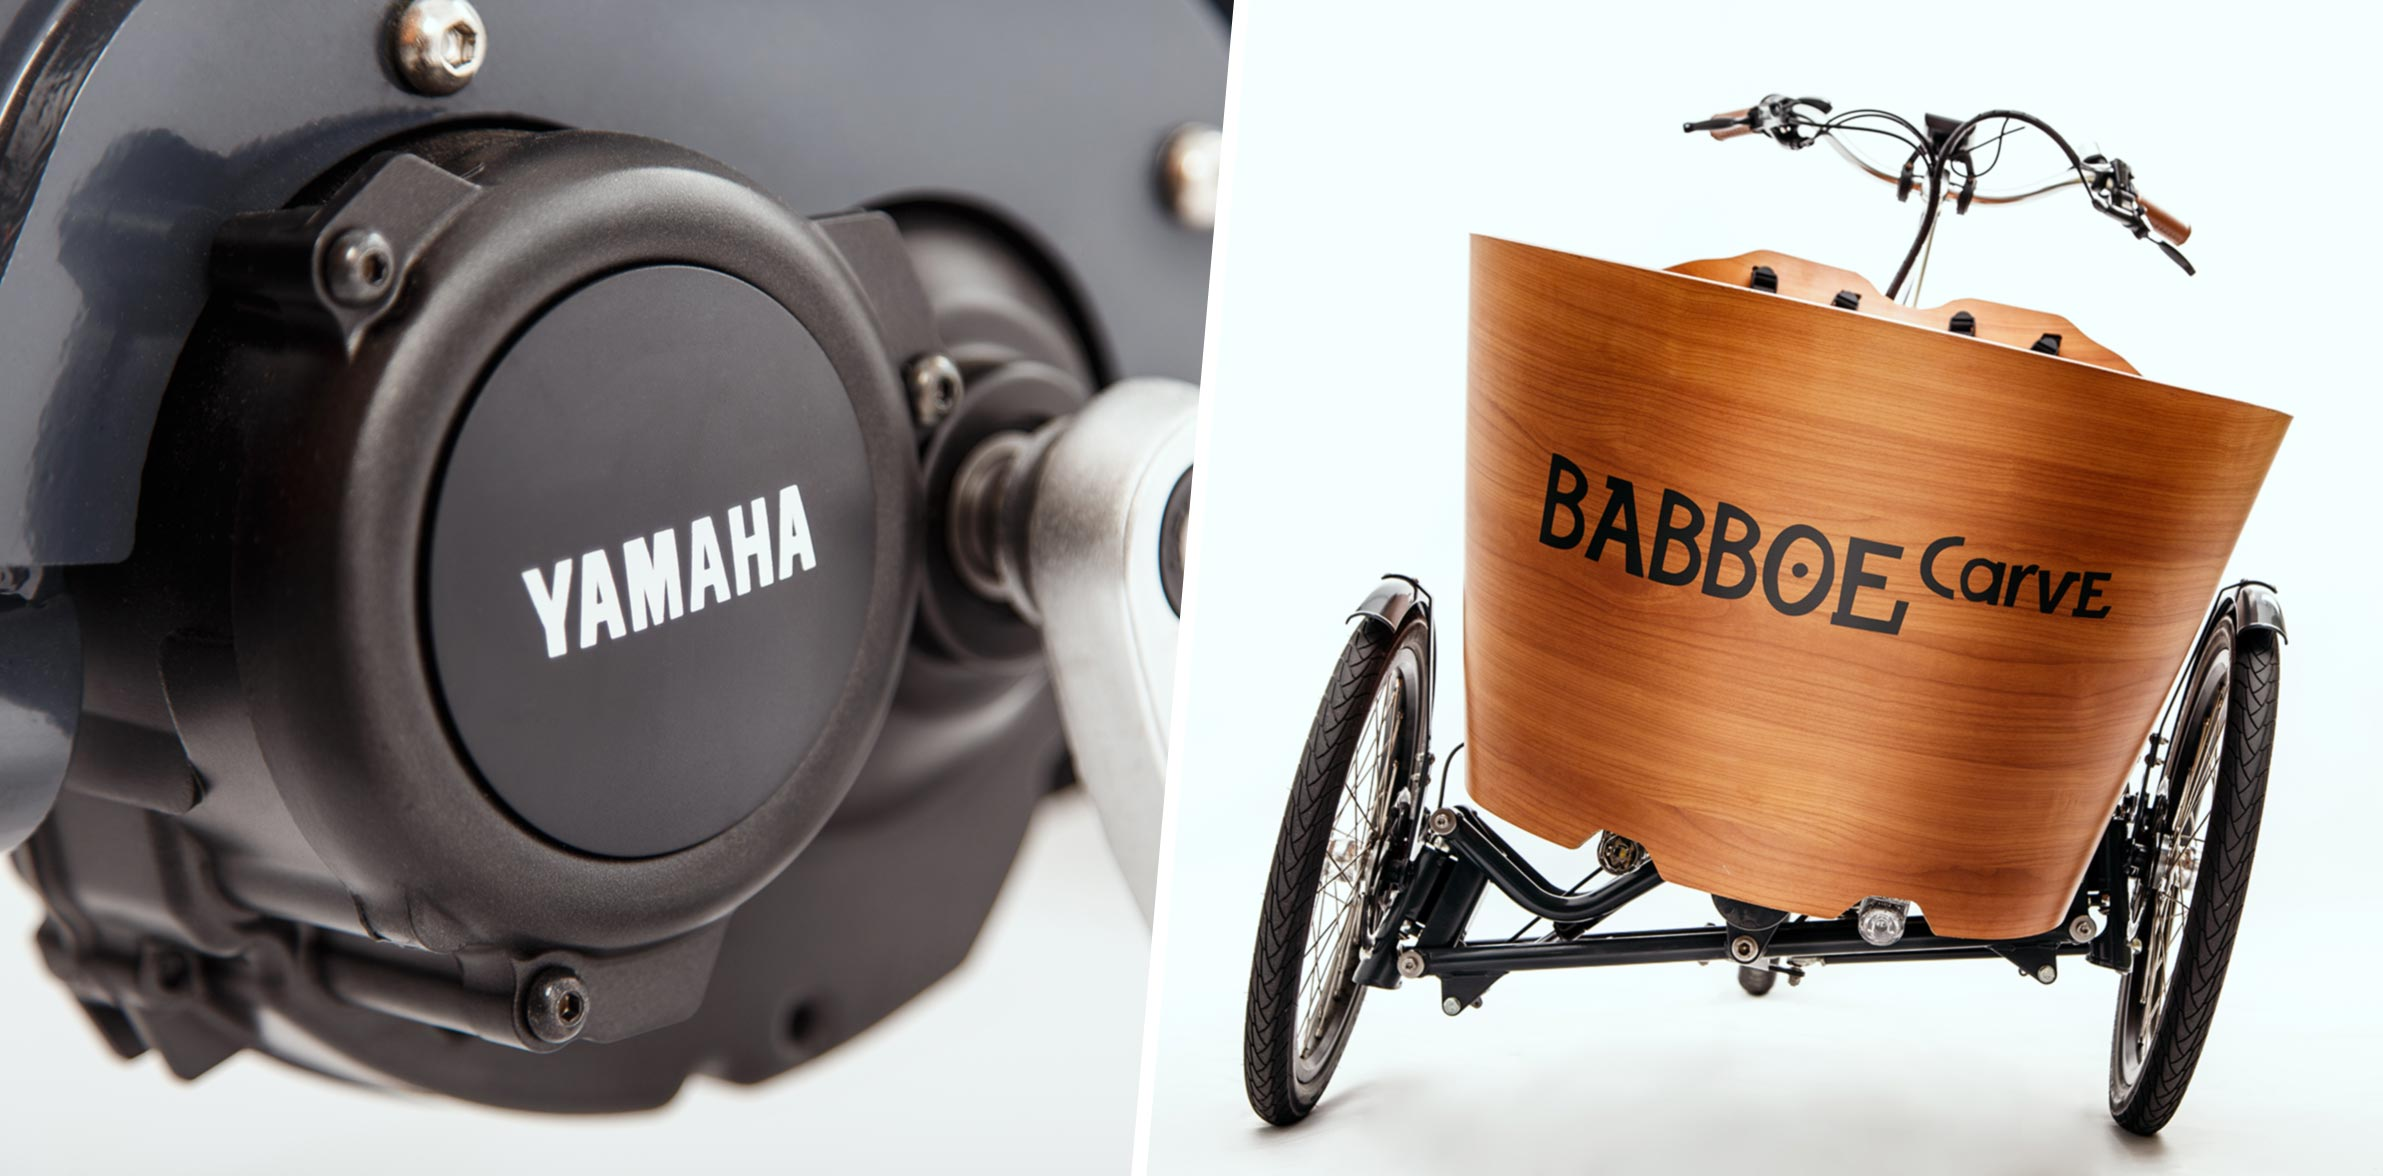 londongreencycles Babboe Carve Yamaha motor 2